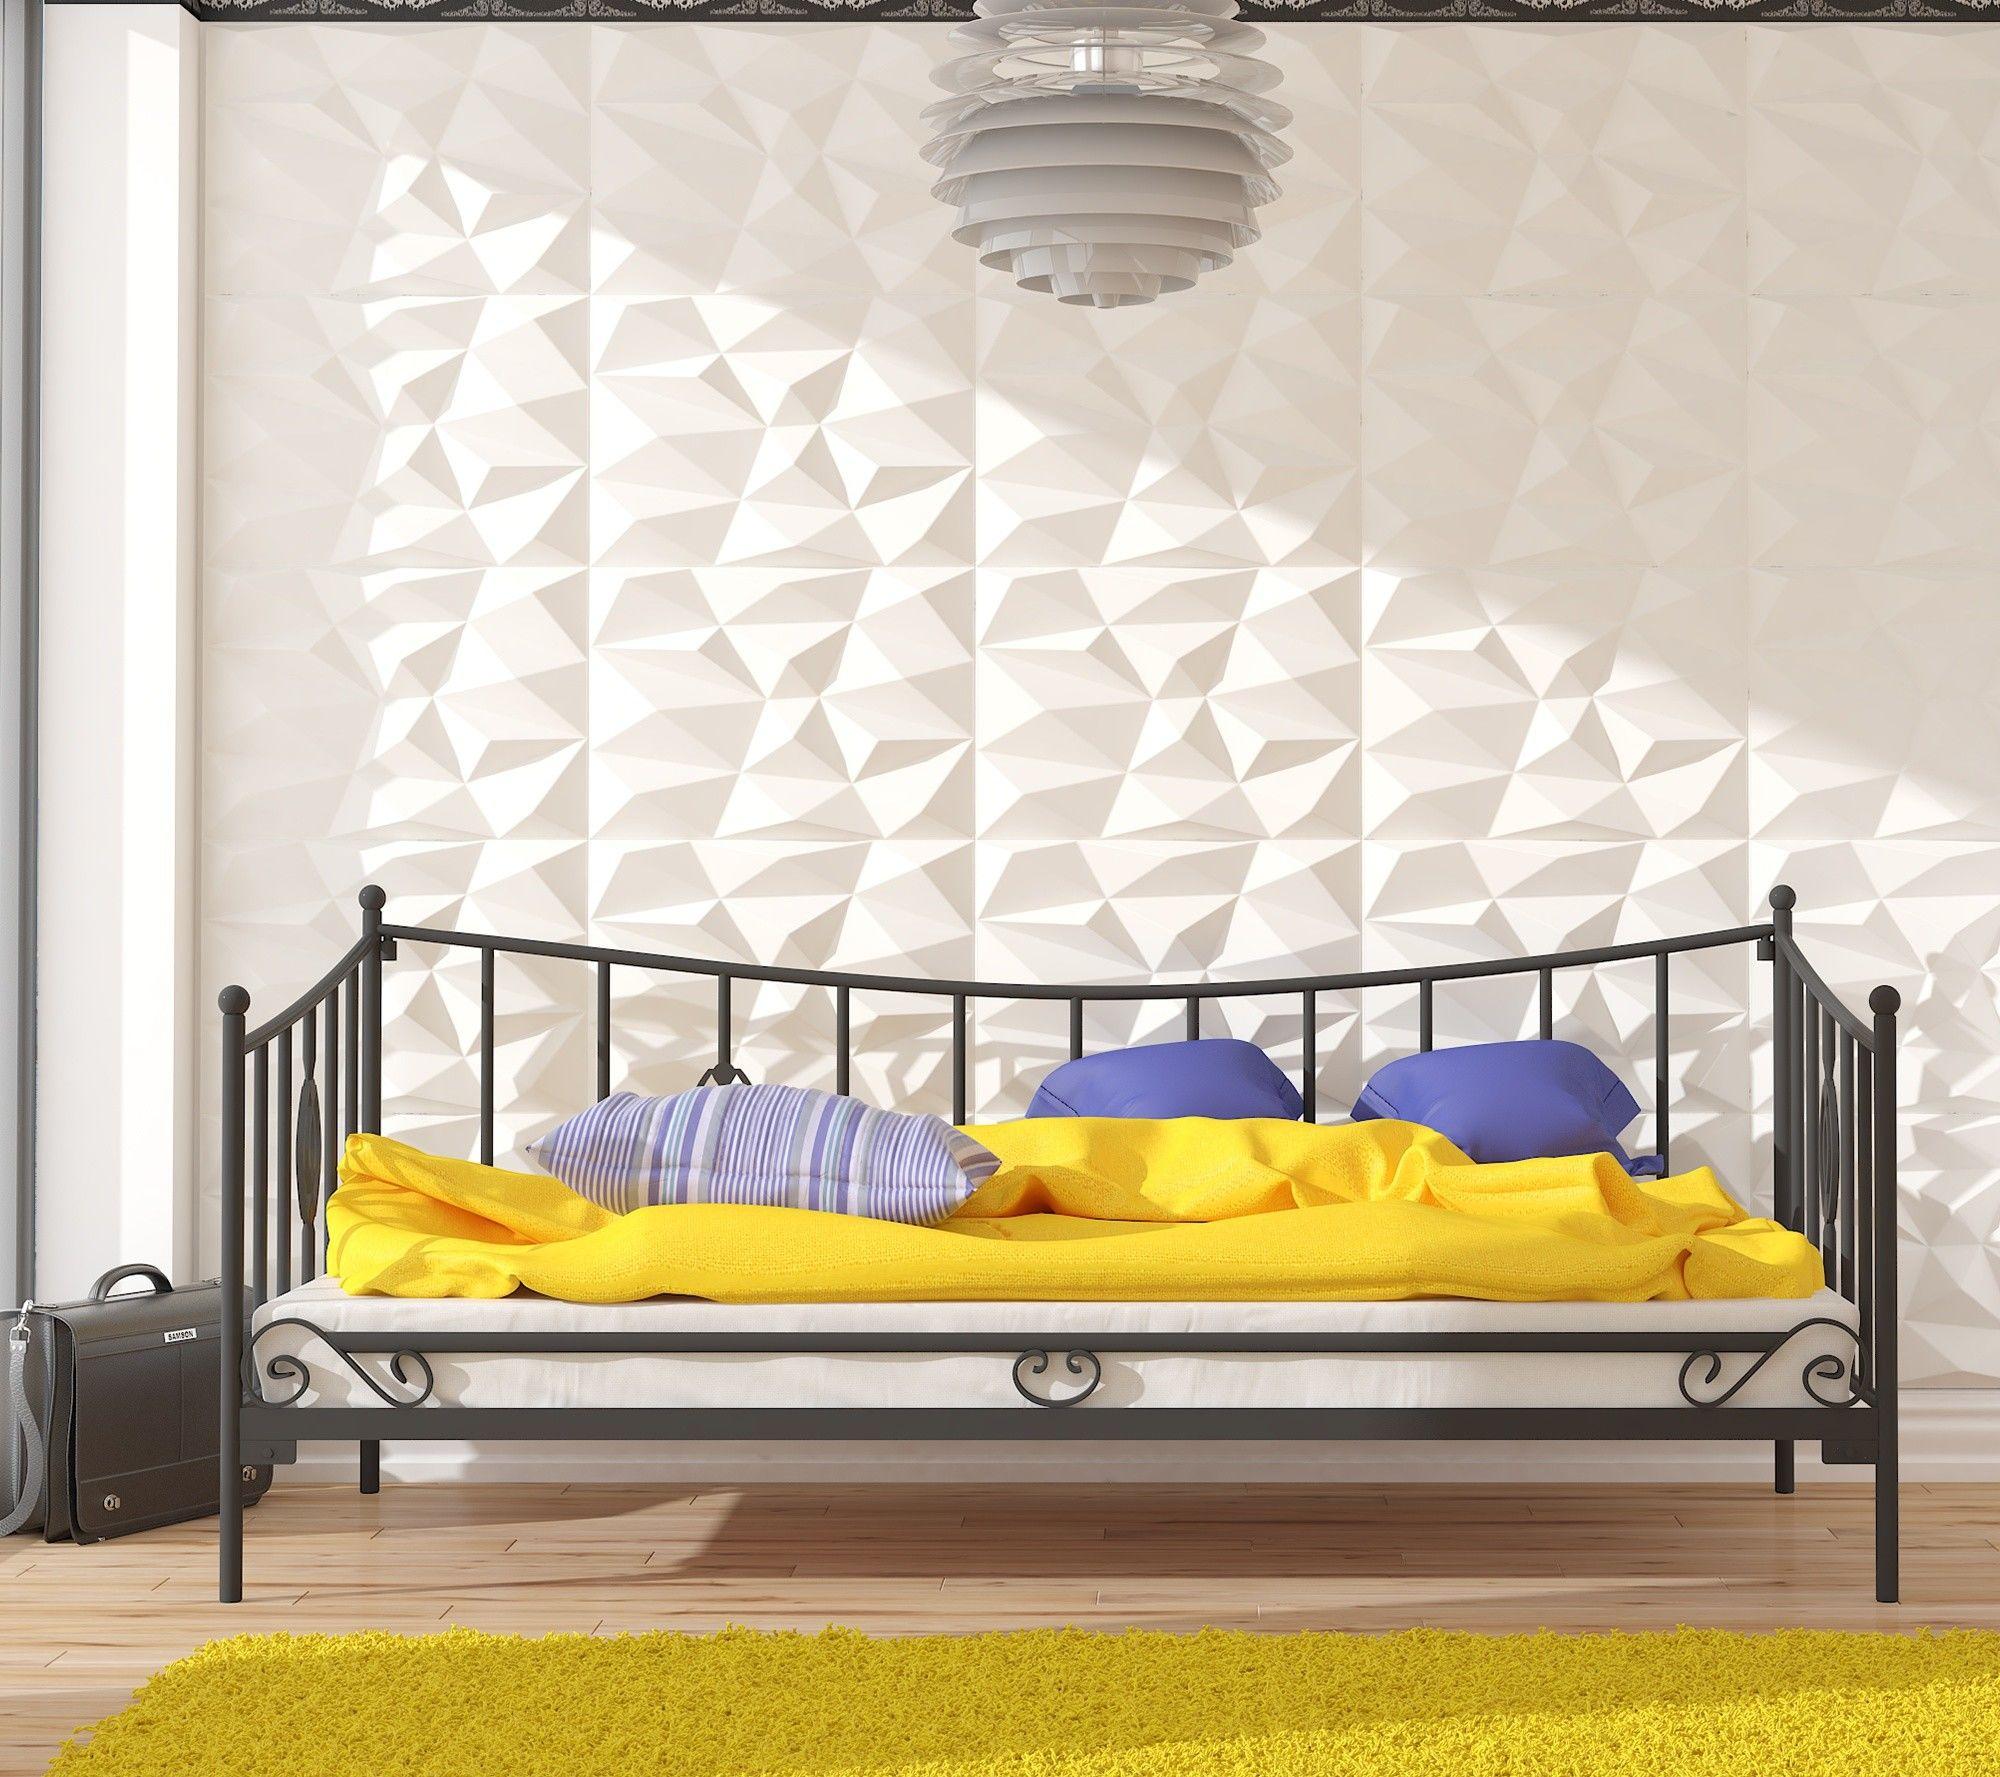 Łóżko metalowe sofa 80x200 wzór 31 ze stelażem